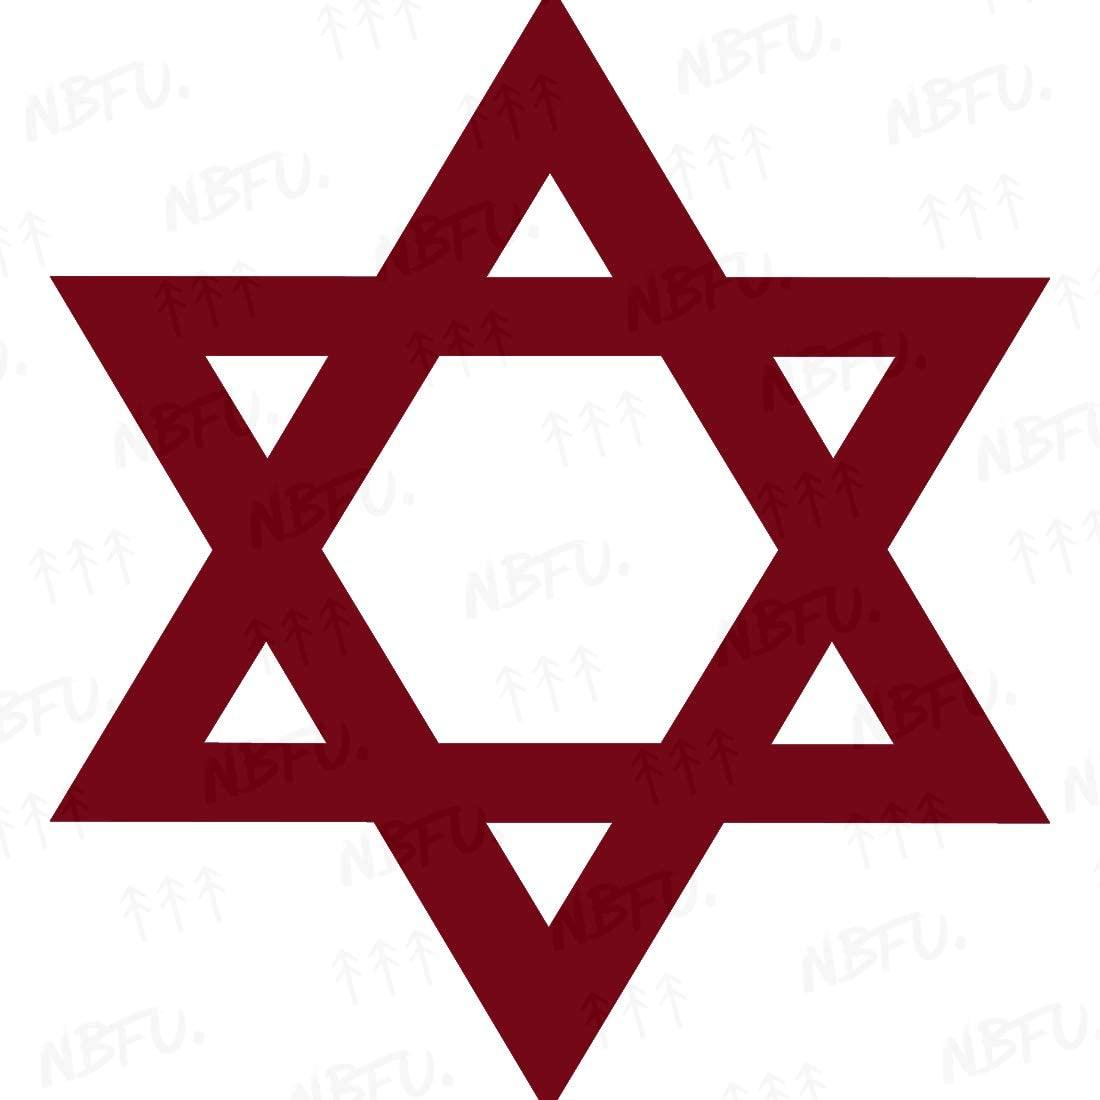 NBFU Decals Judaism Jewish Star David Religious Symbols 1 (Burgundy) (Set of 2) Premium Waterproof Vinyl Decal Stickers Laptop Phone Accessory Helmet Car Window Bumper Mug Tuber Cup Door Wall